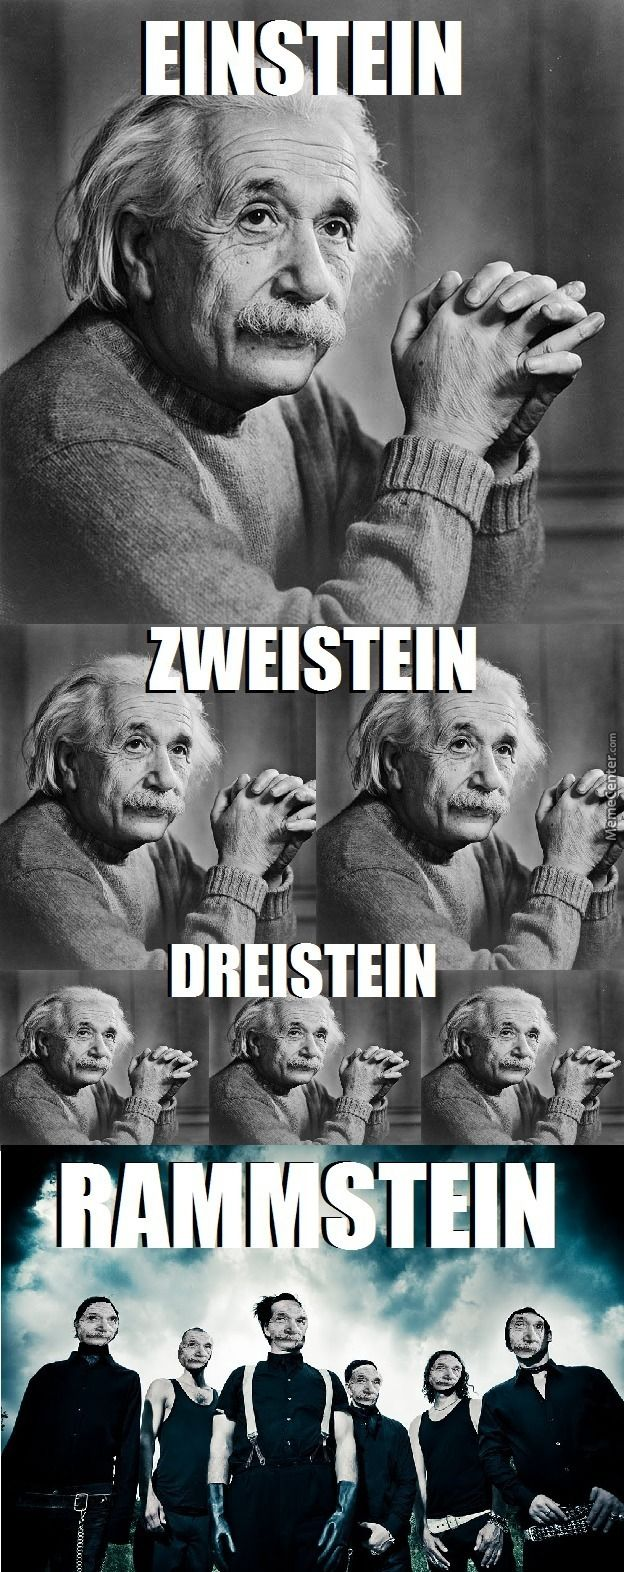 rammstein memes - Google Search LOL